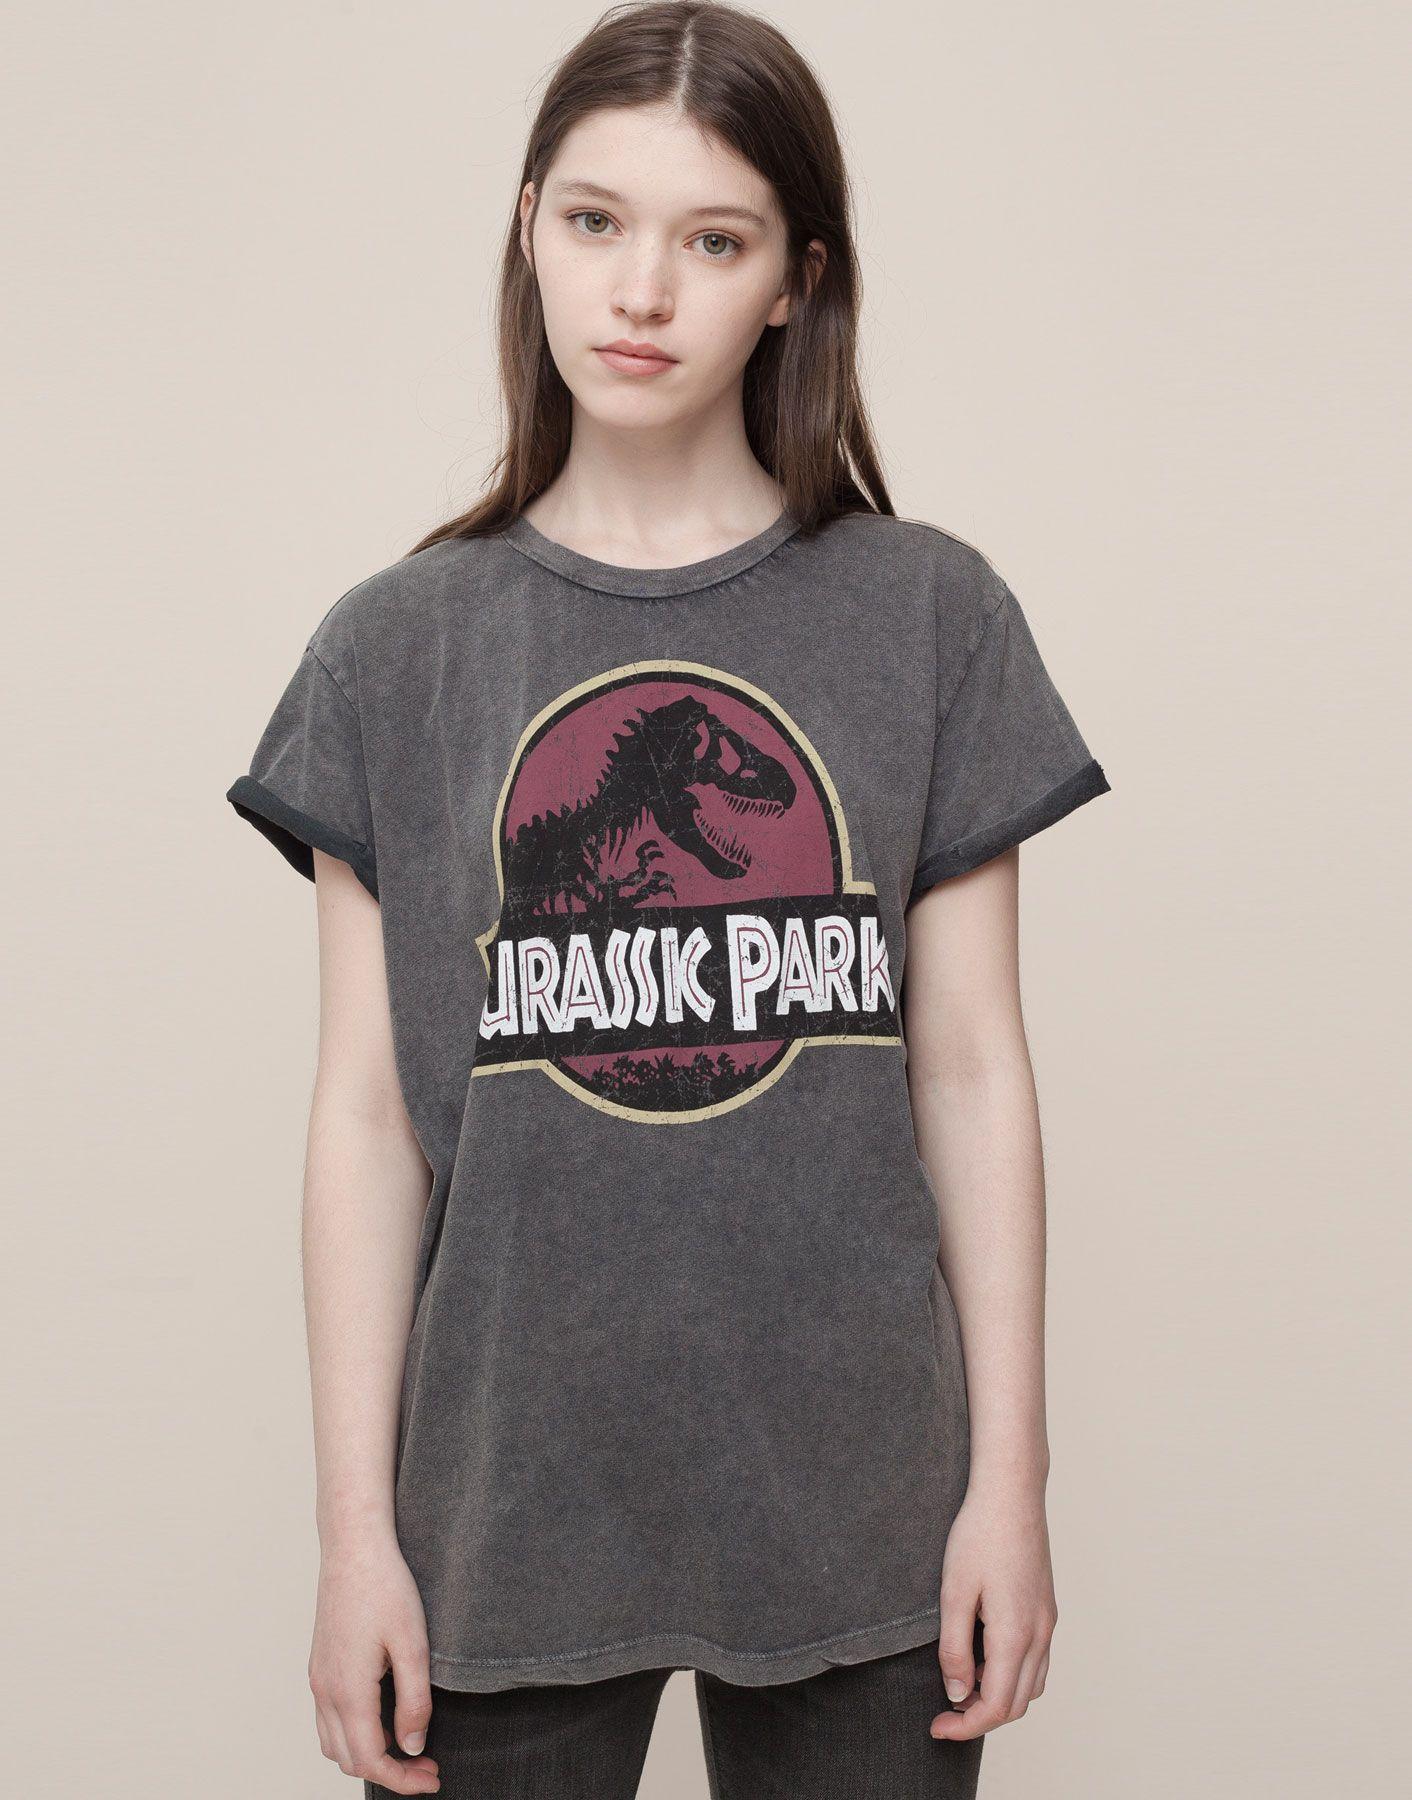 Koszulka Jurassic Park Koszulki I Topy Dla Niej Pull Bear